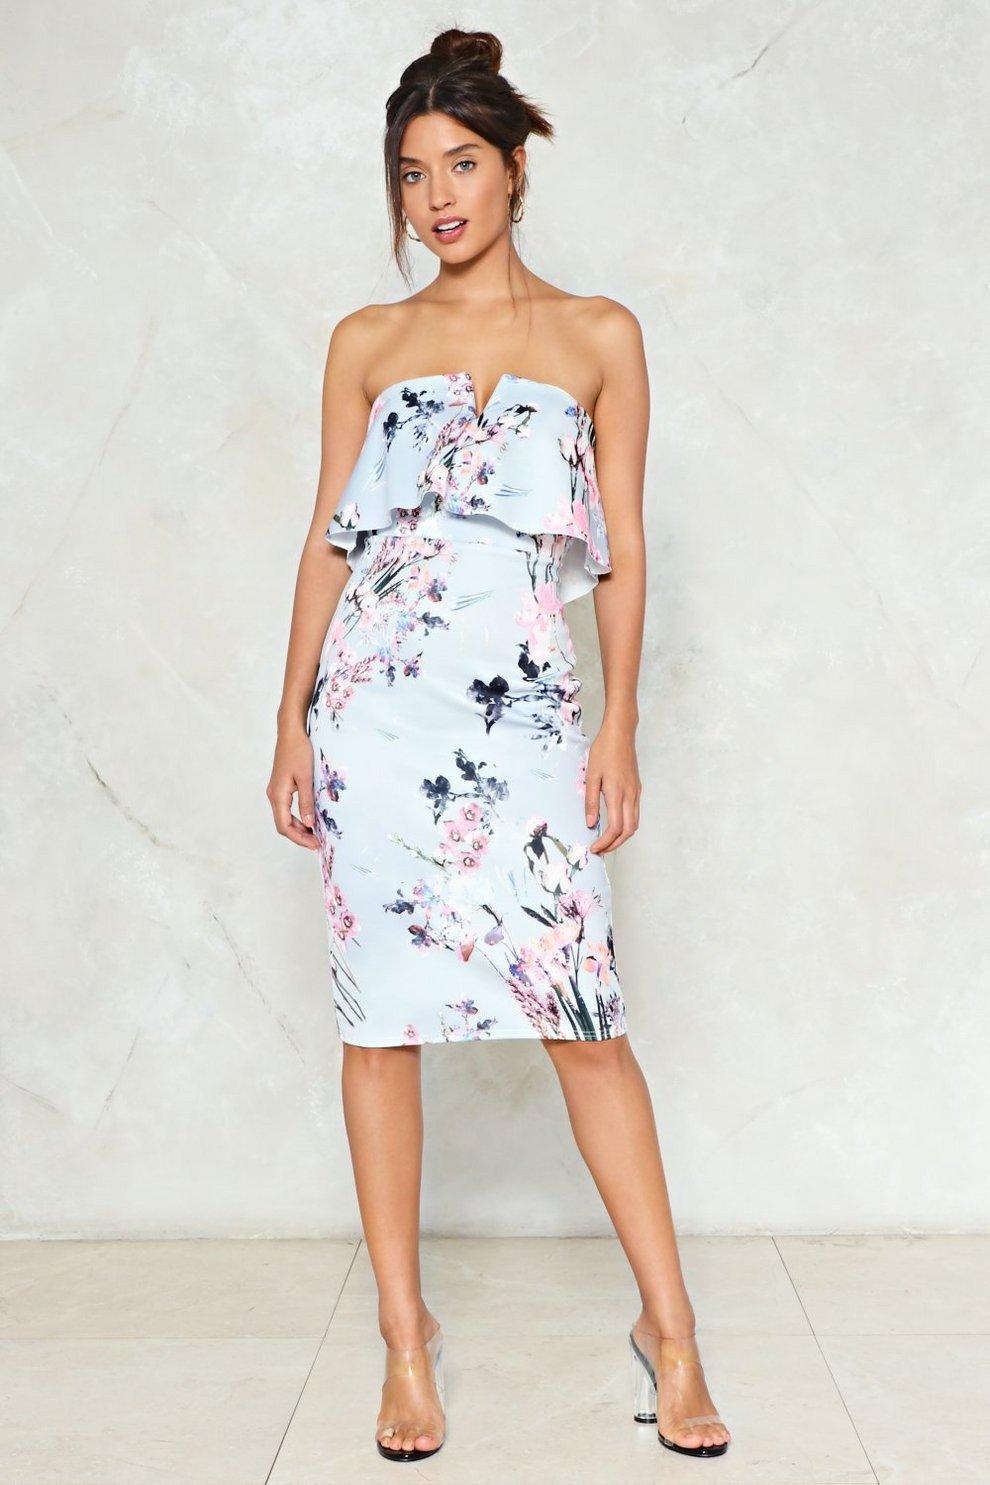 c799eb5265c94 Spring Affair Floral Midi Dress